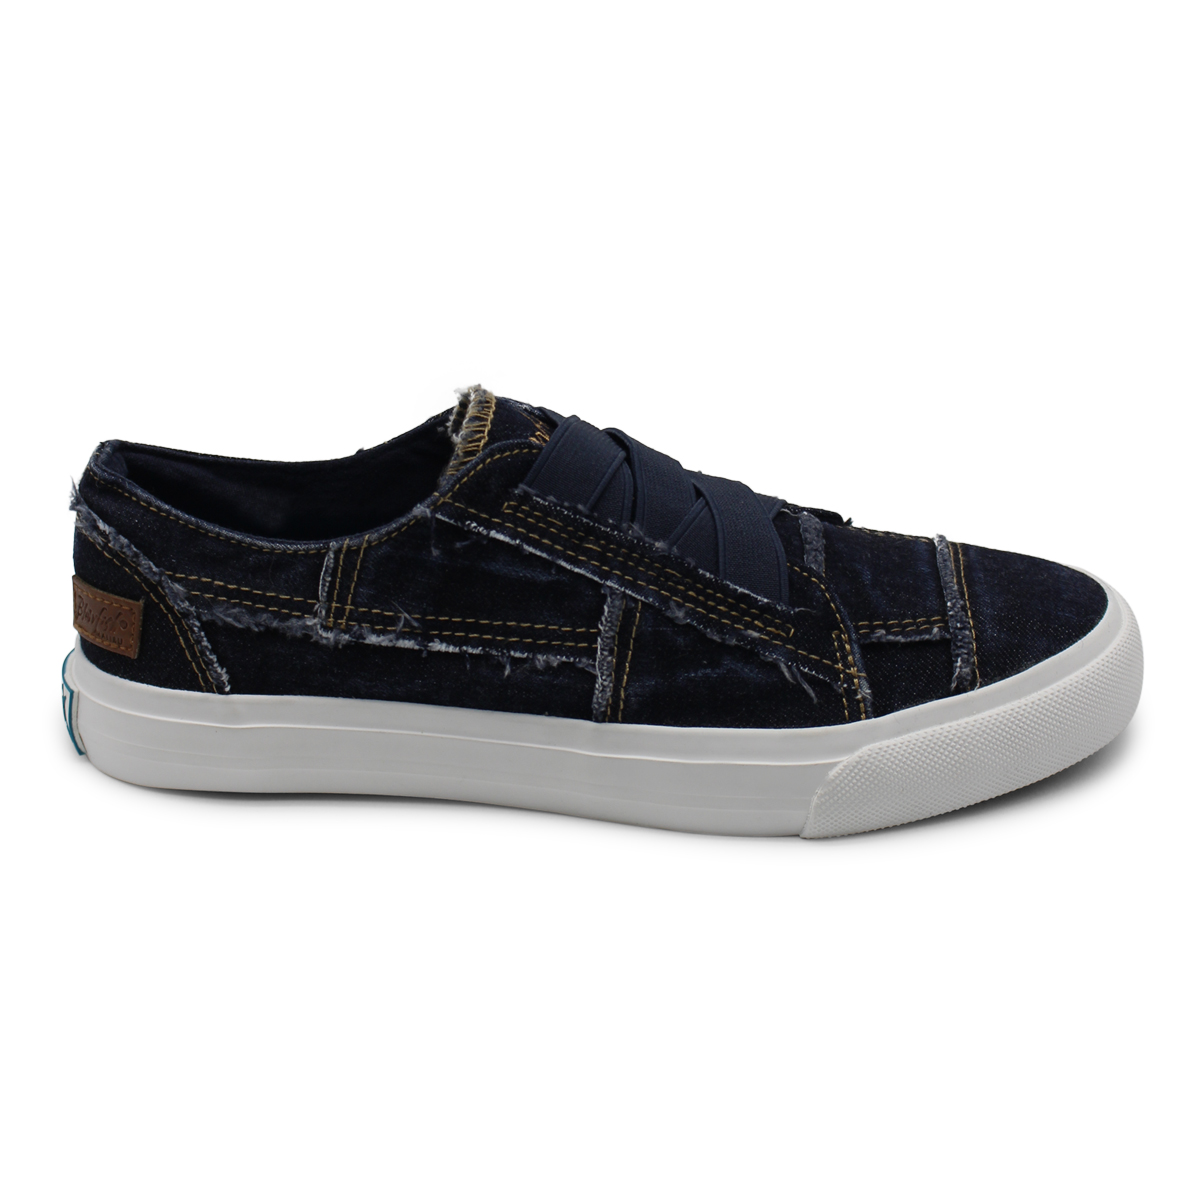 f3ad8c8952dd Marley - Womens Slip On Elastic Sneakers